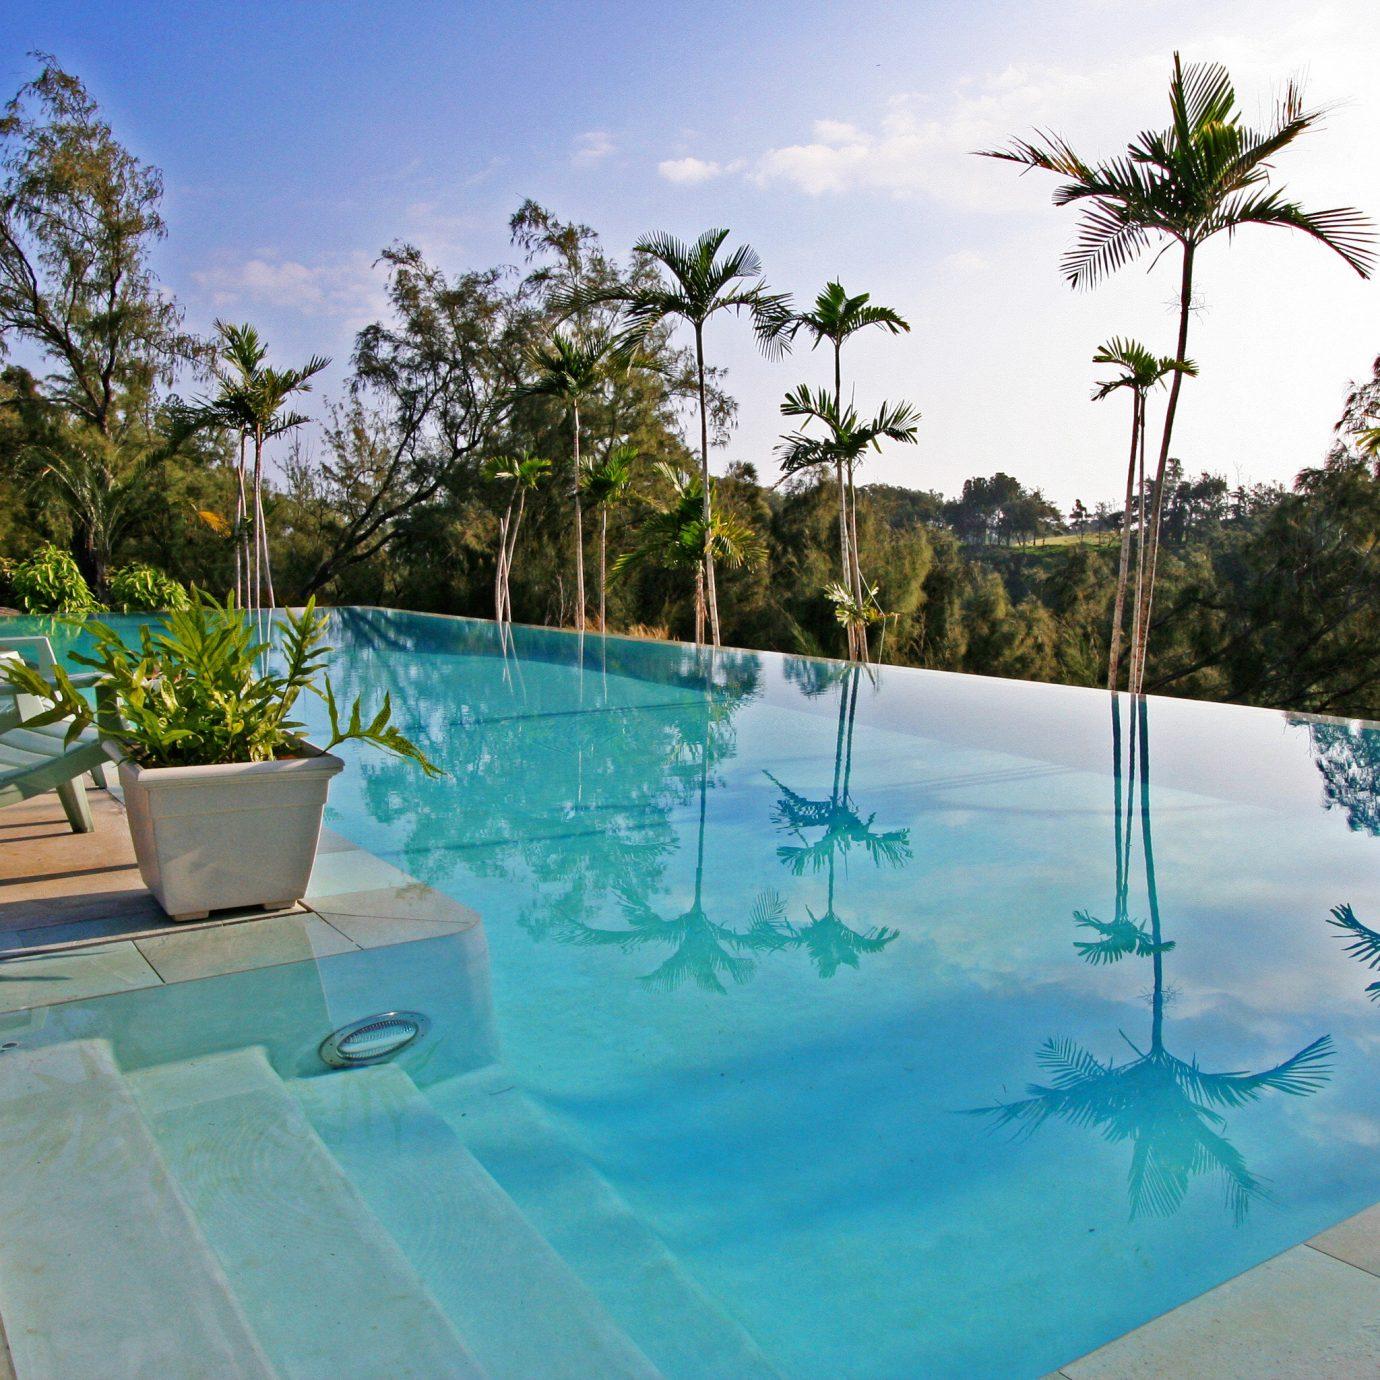 Boutique Eco Outdoors Pool tree sky swimming pool property leisure Resort Villa backyard condominium Deck day